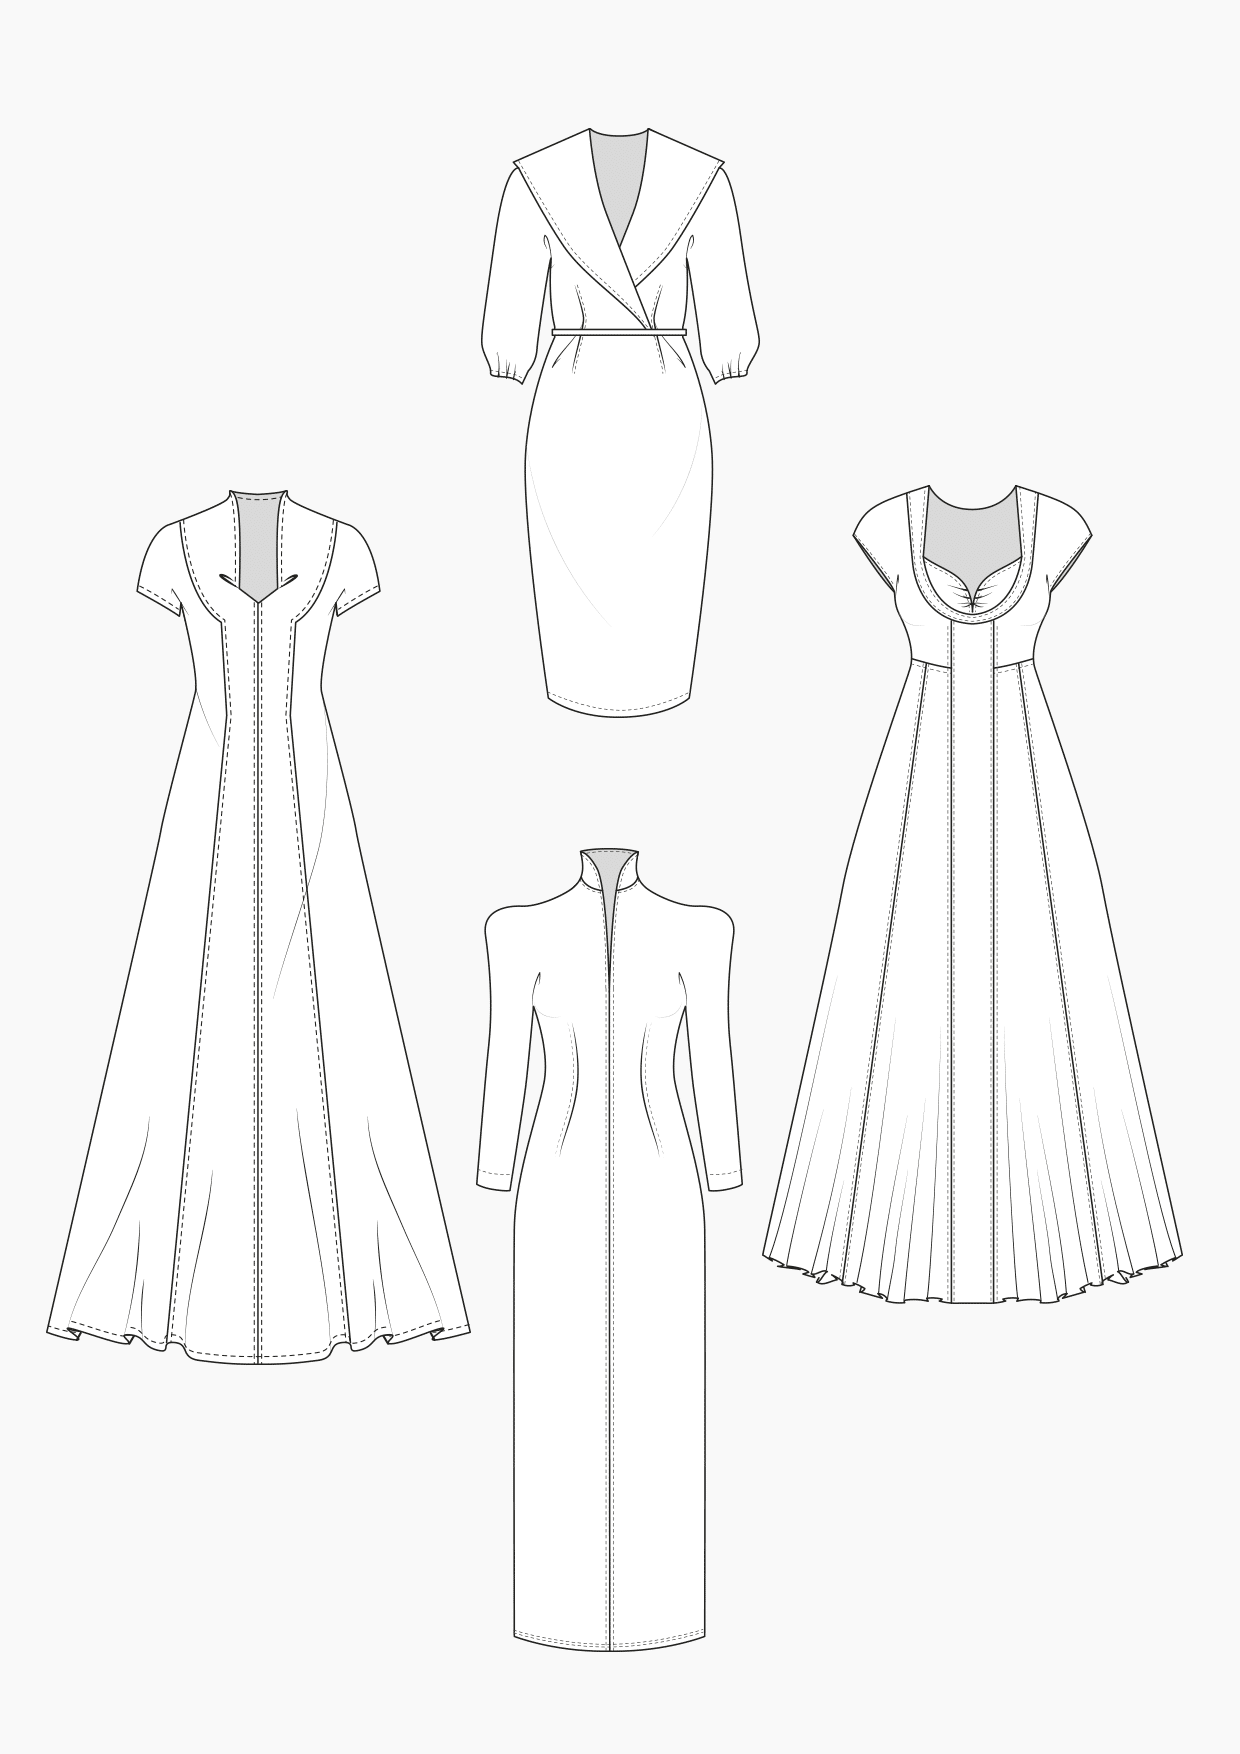 Produkt: Schnitt-Technik Brautkleider 1